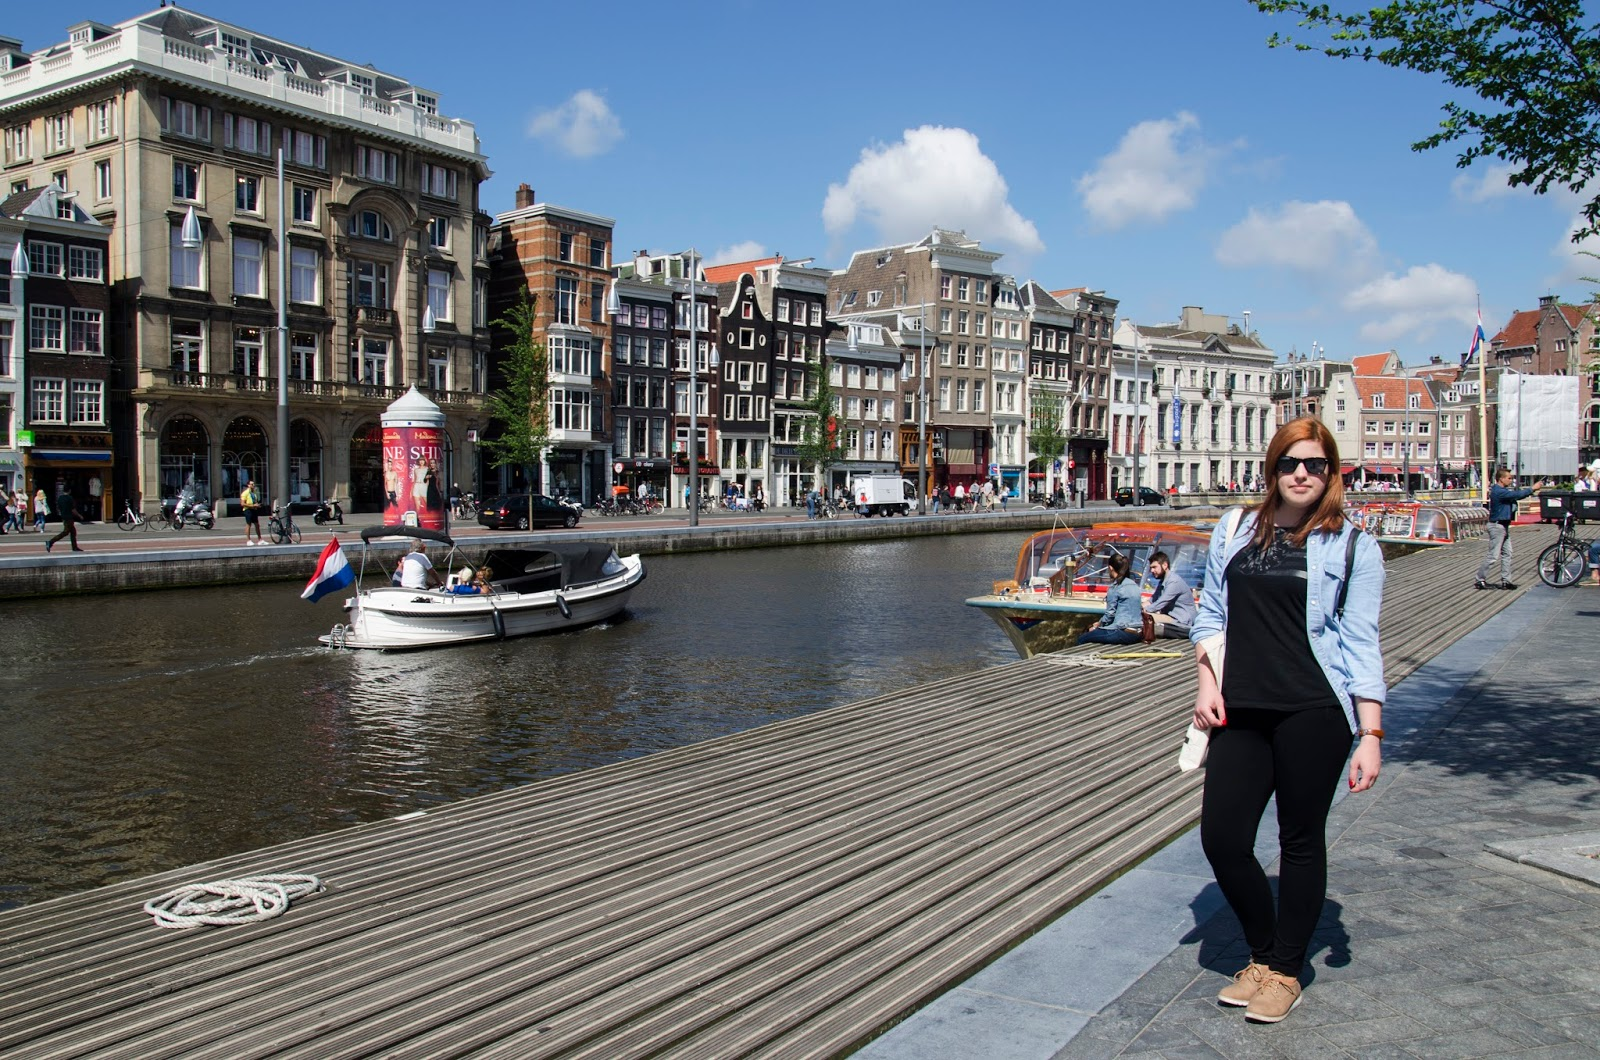 holandia, amsterdam, holland, netherlands, trip, wycieczka